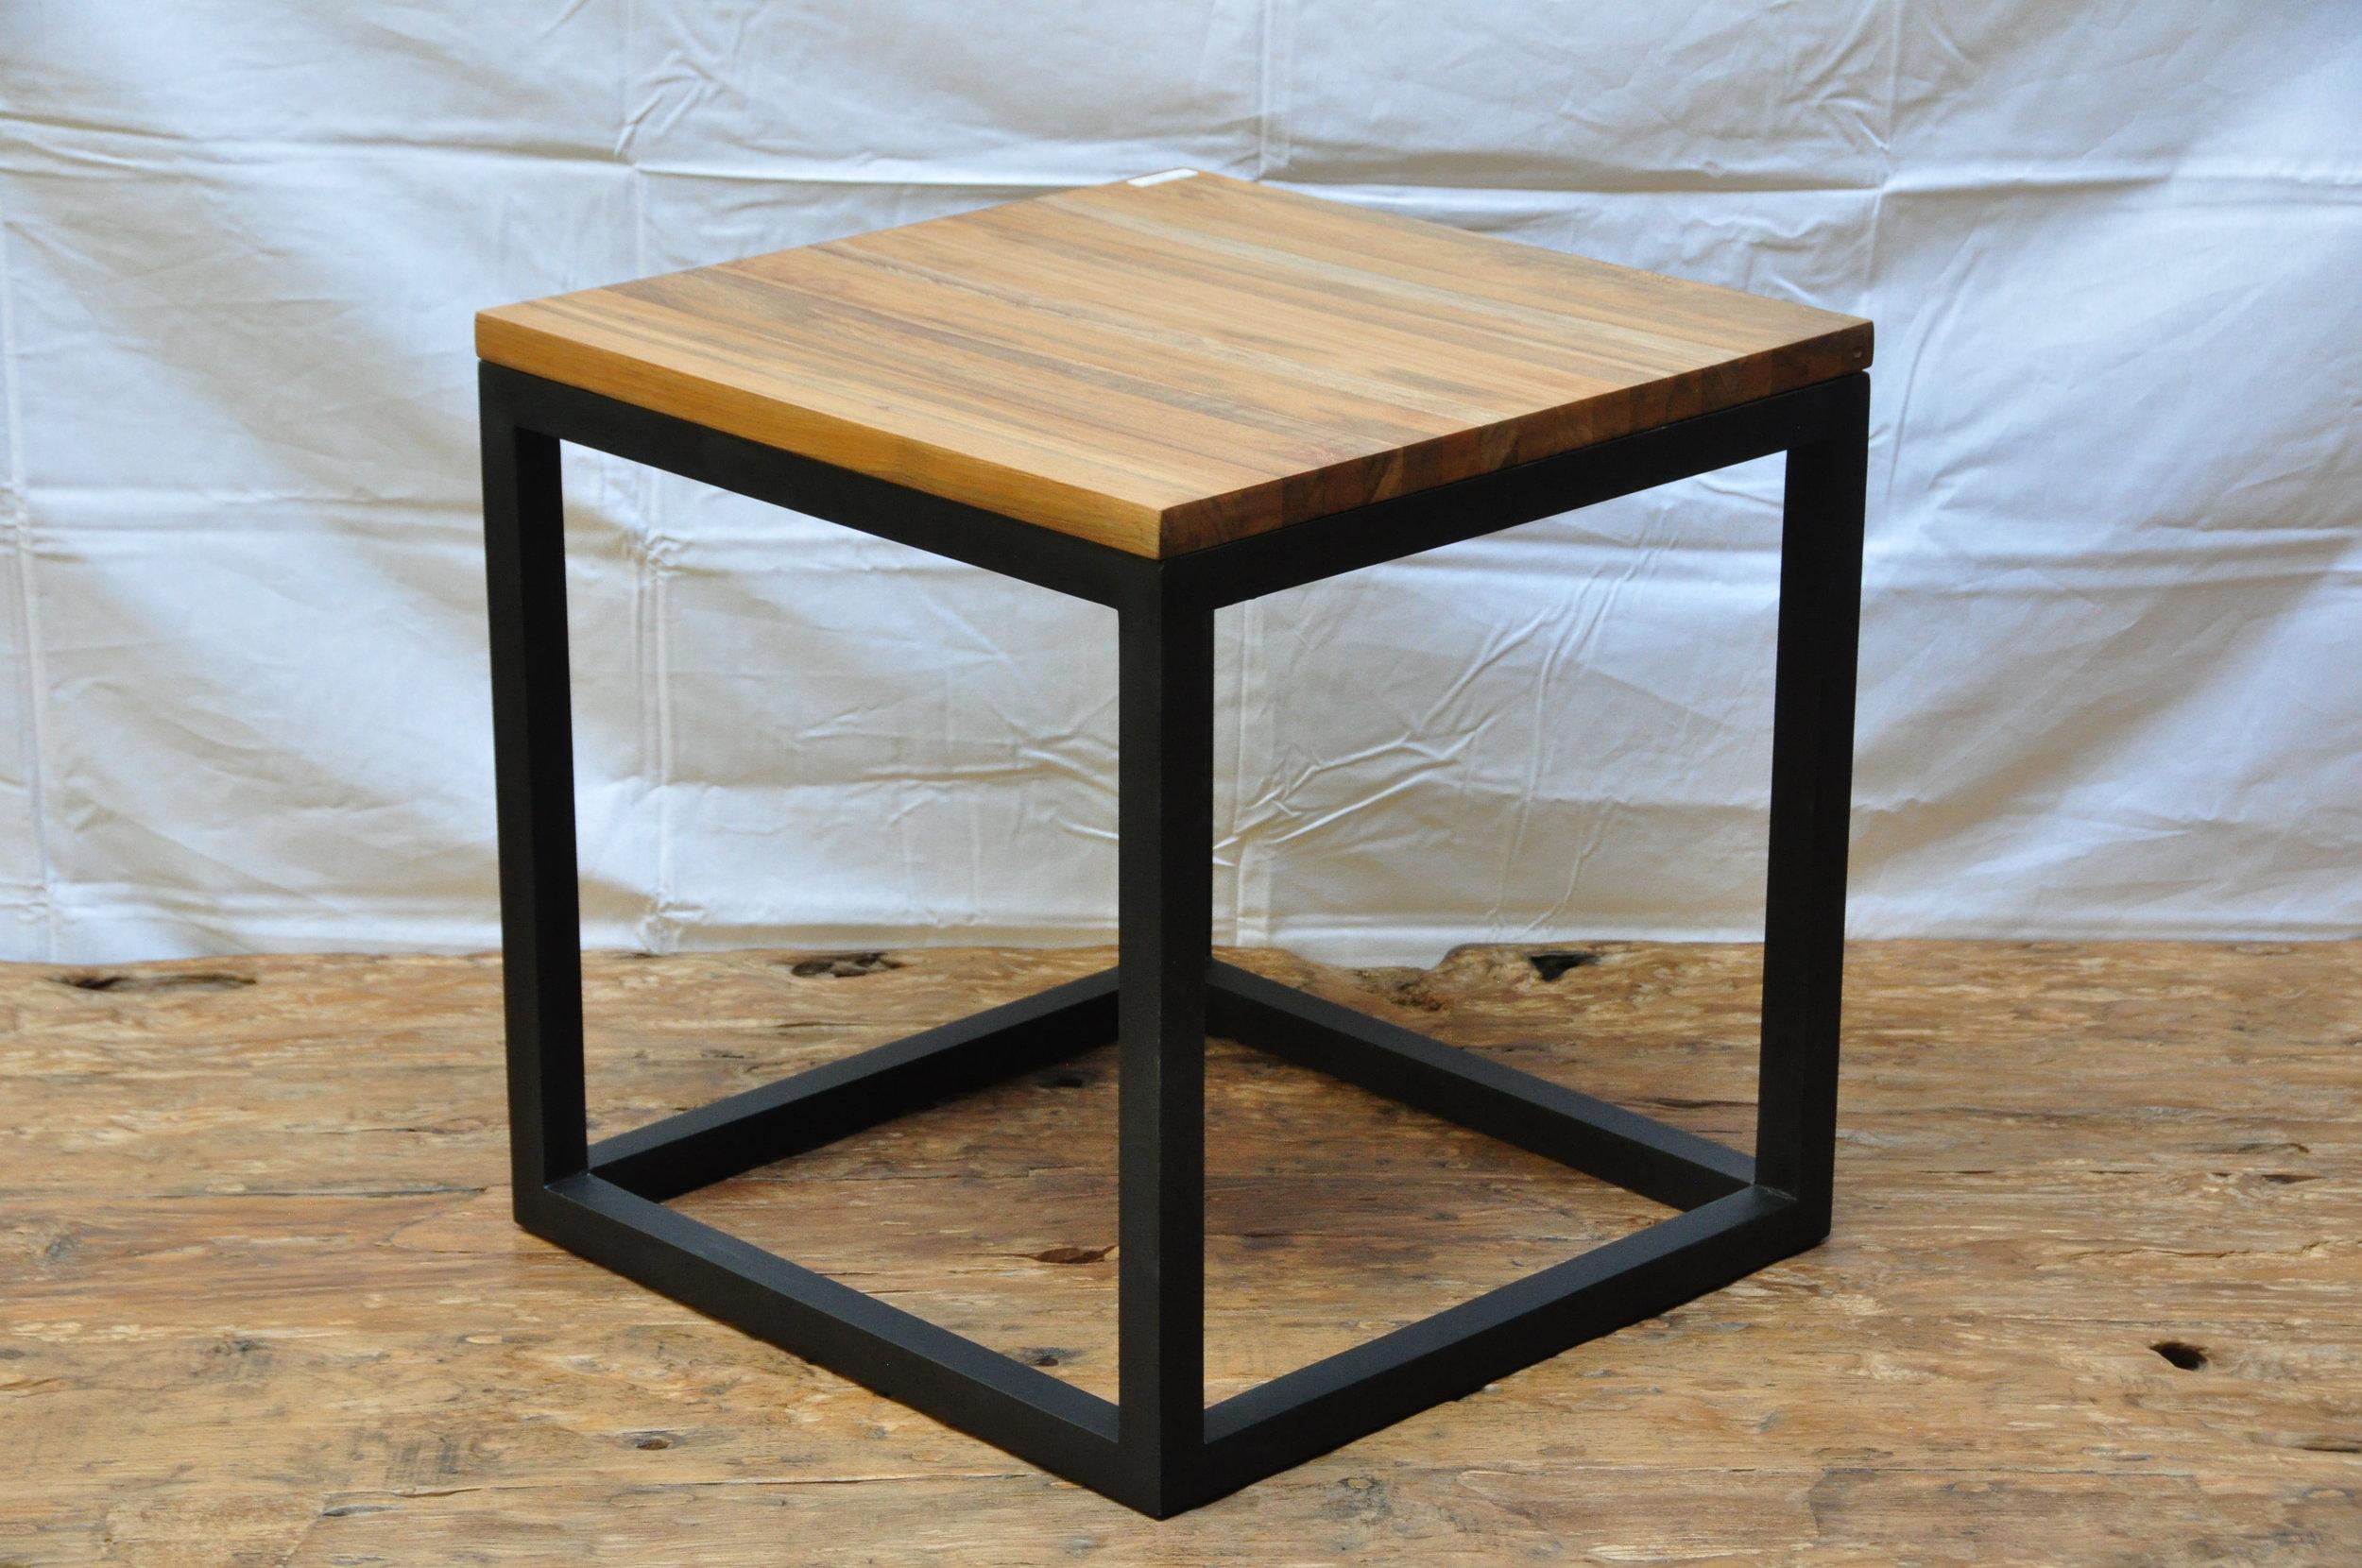 "Teak Cube Side Table  19.75""W x 19.75""D x 19.75""H  Price: $170"